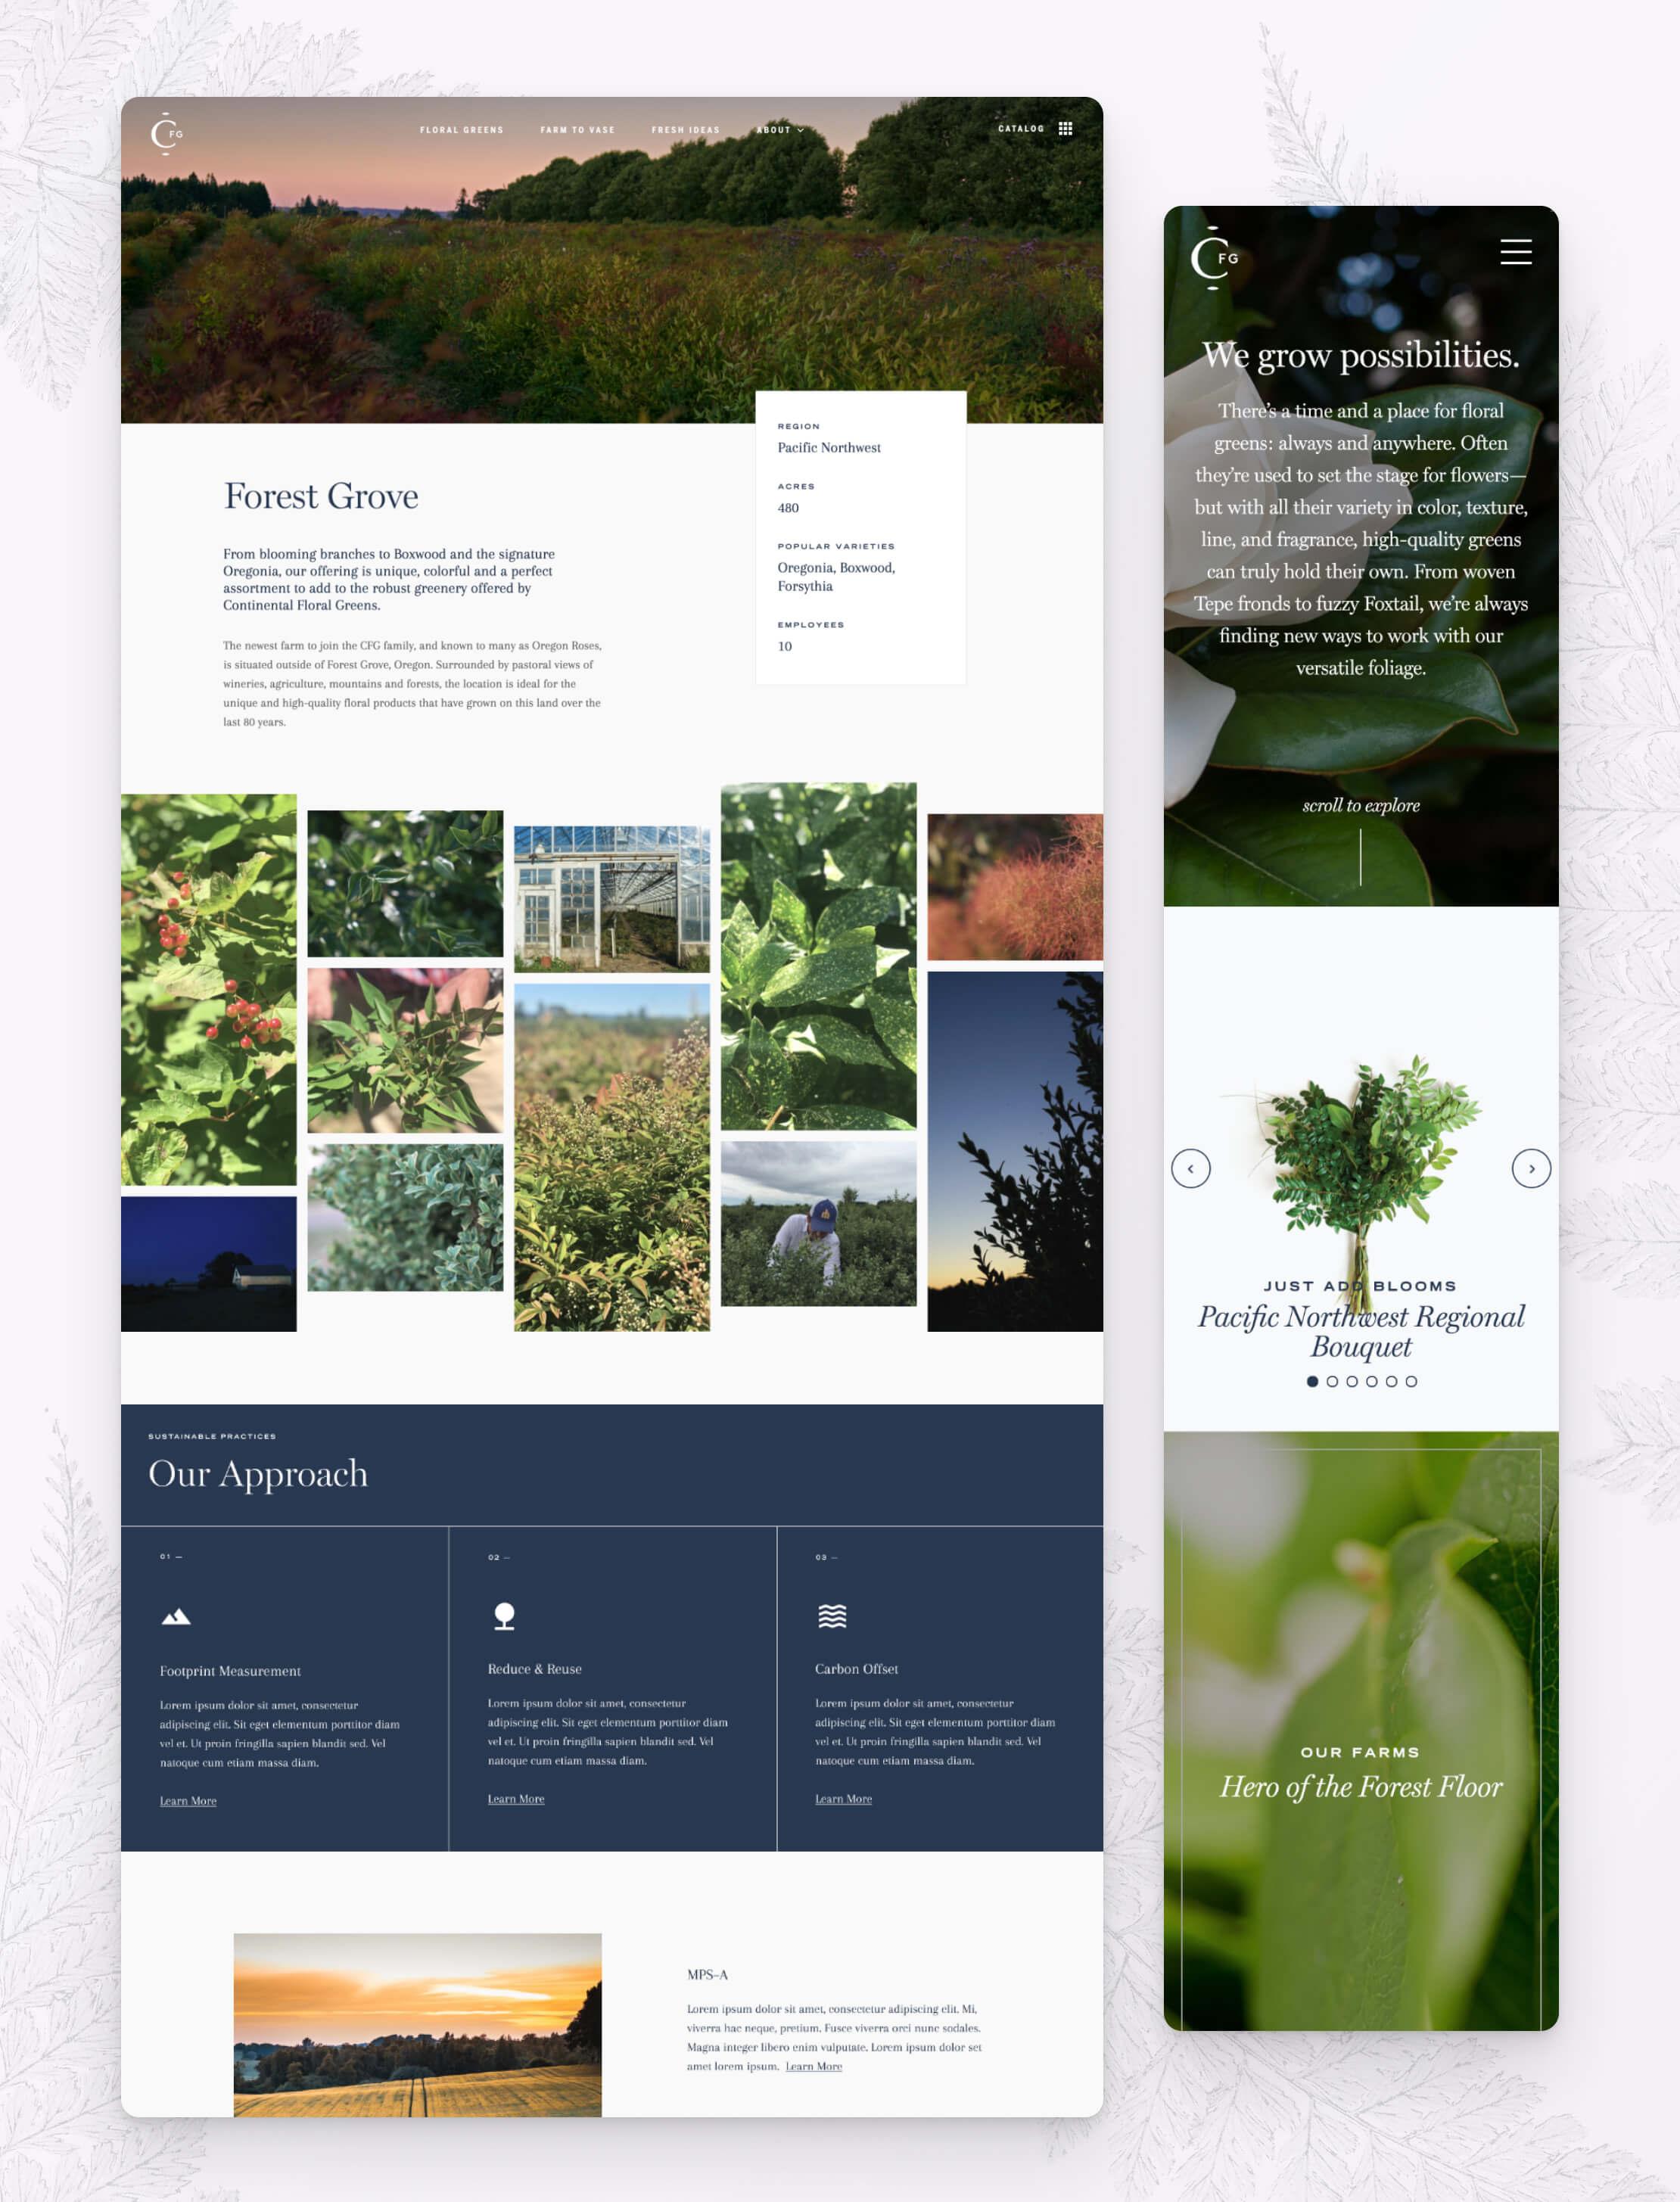 Desktop & mobile screen captures of Continental Floral Green's website pages.